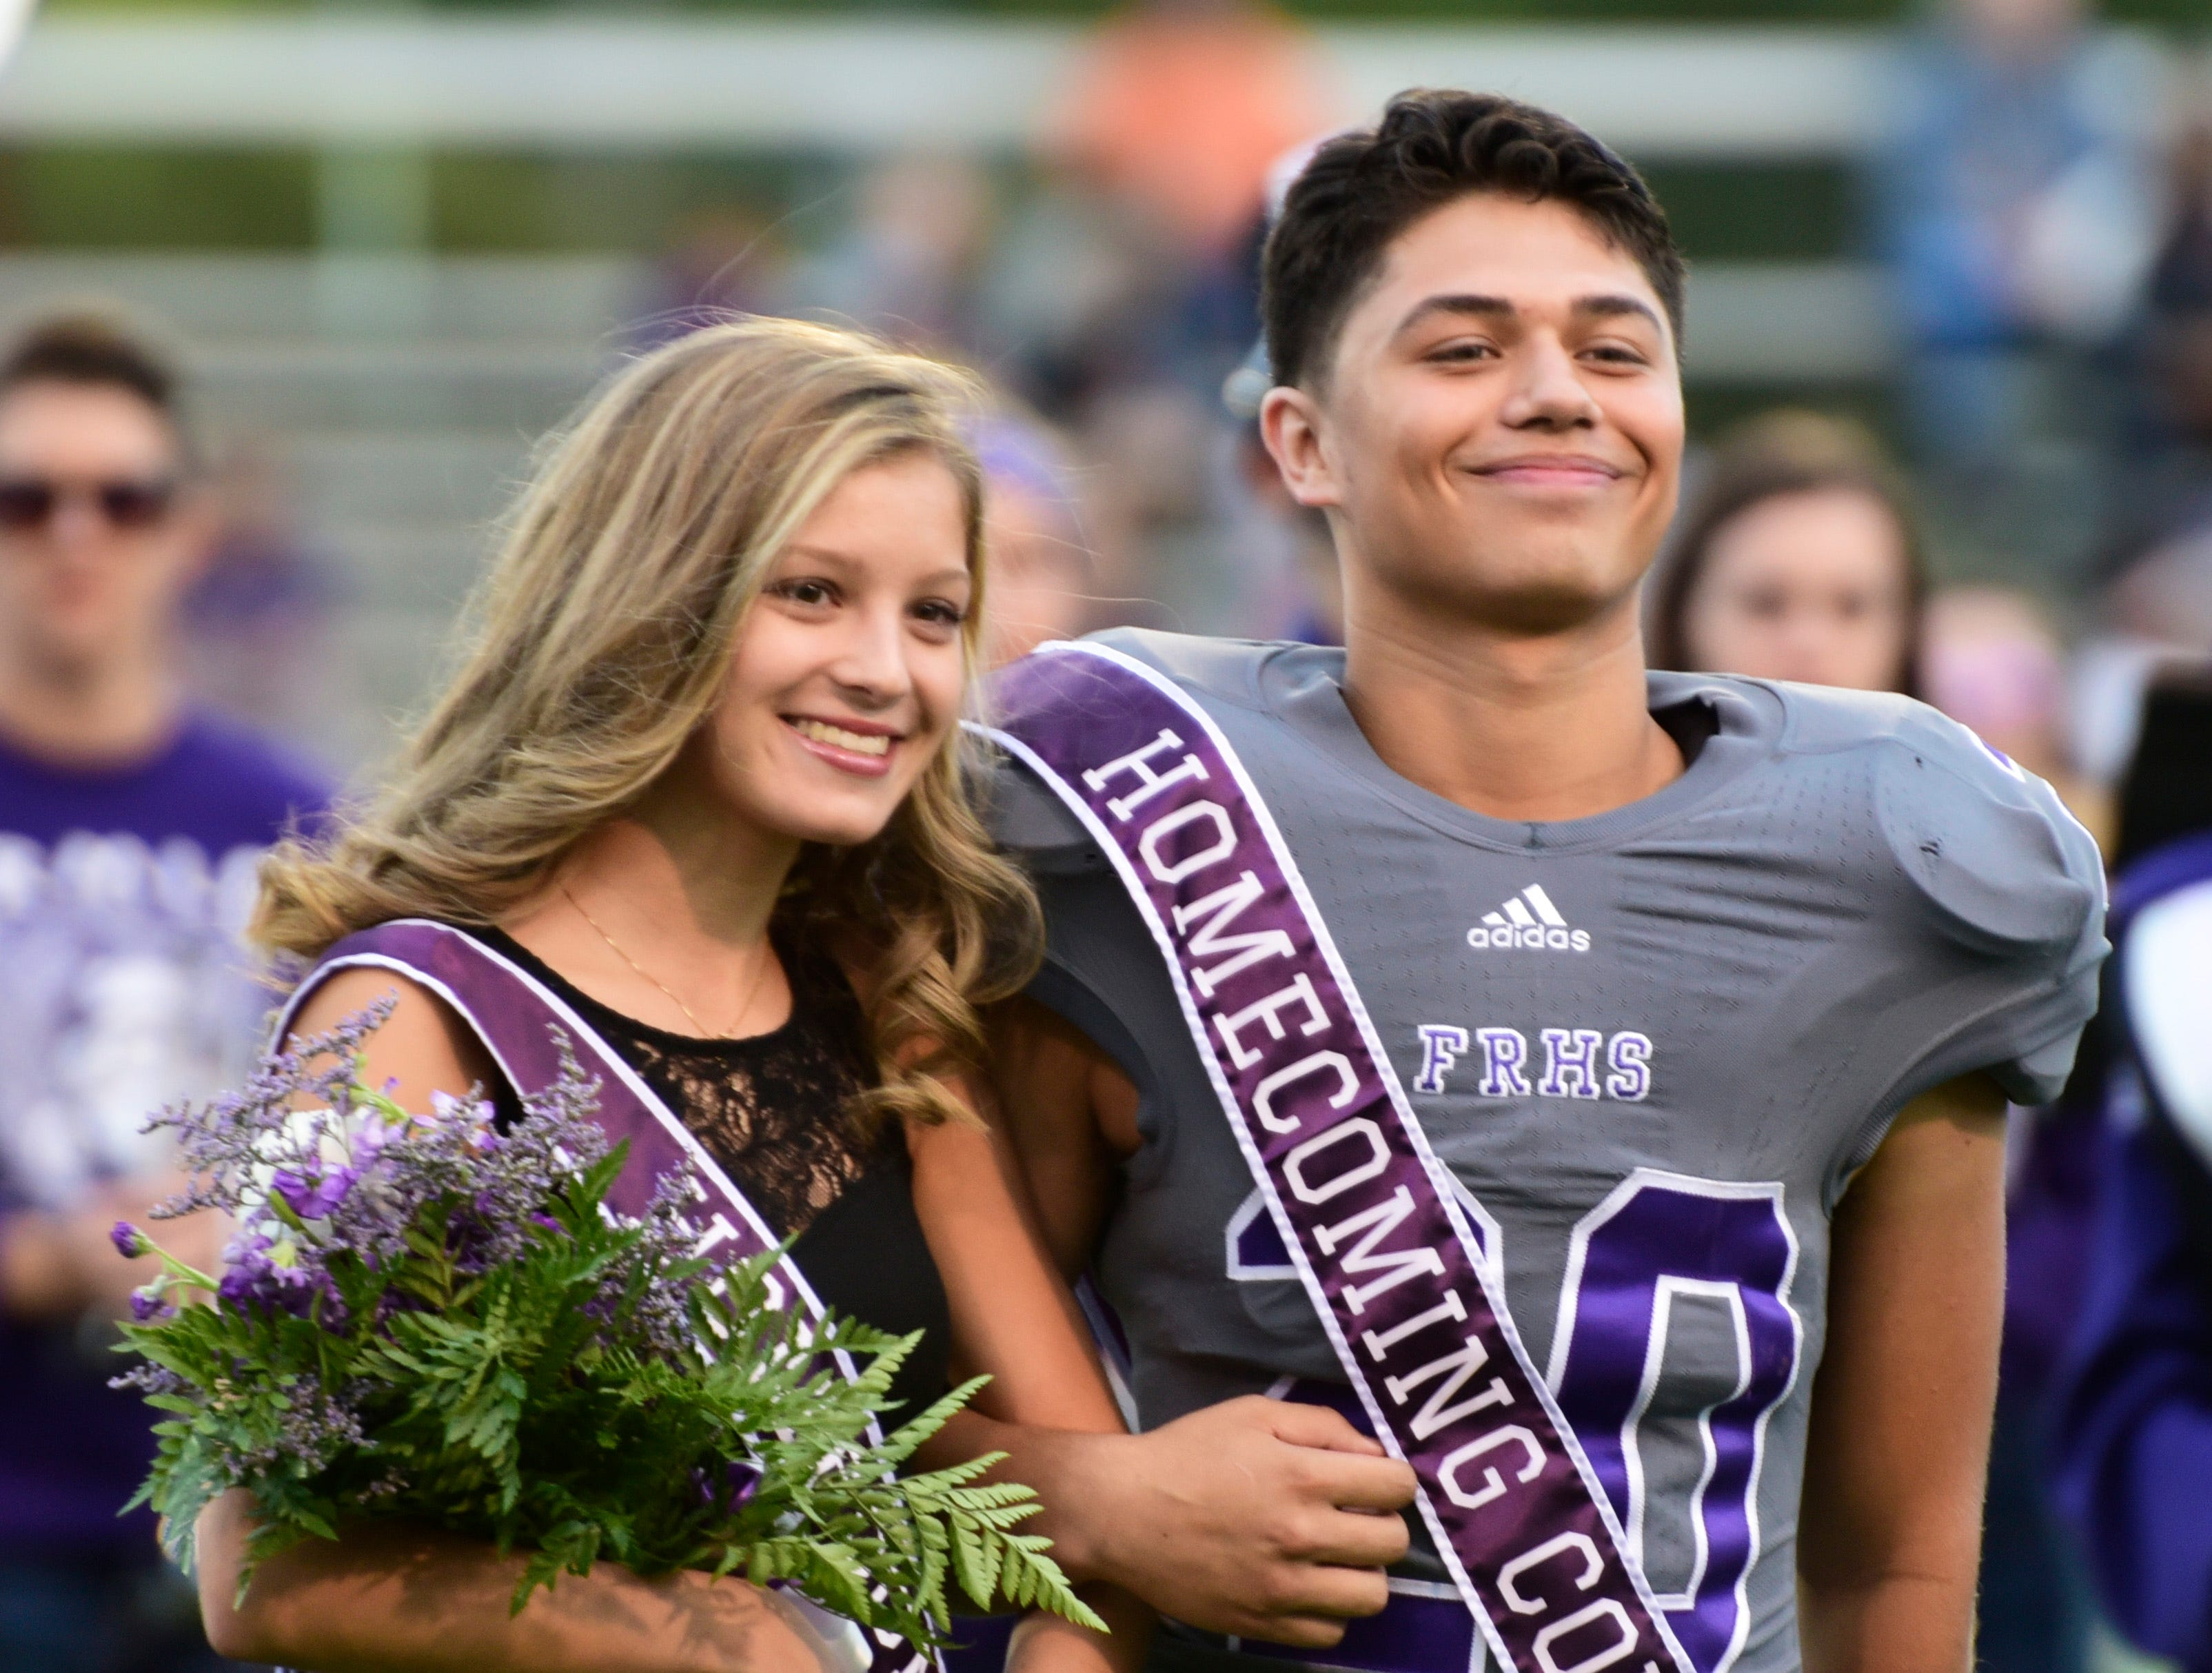 Fremont Ross 2018 sophomore homecoming attendants Jenna Ruiz, left, and Kaden Garza.